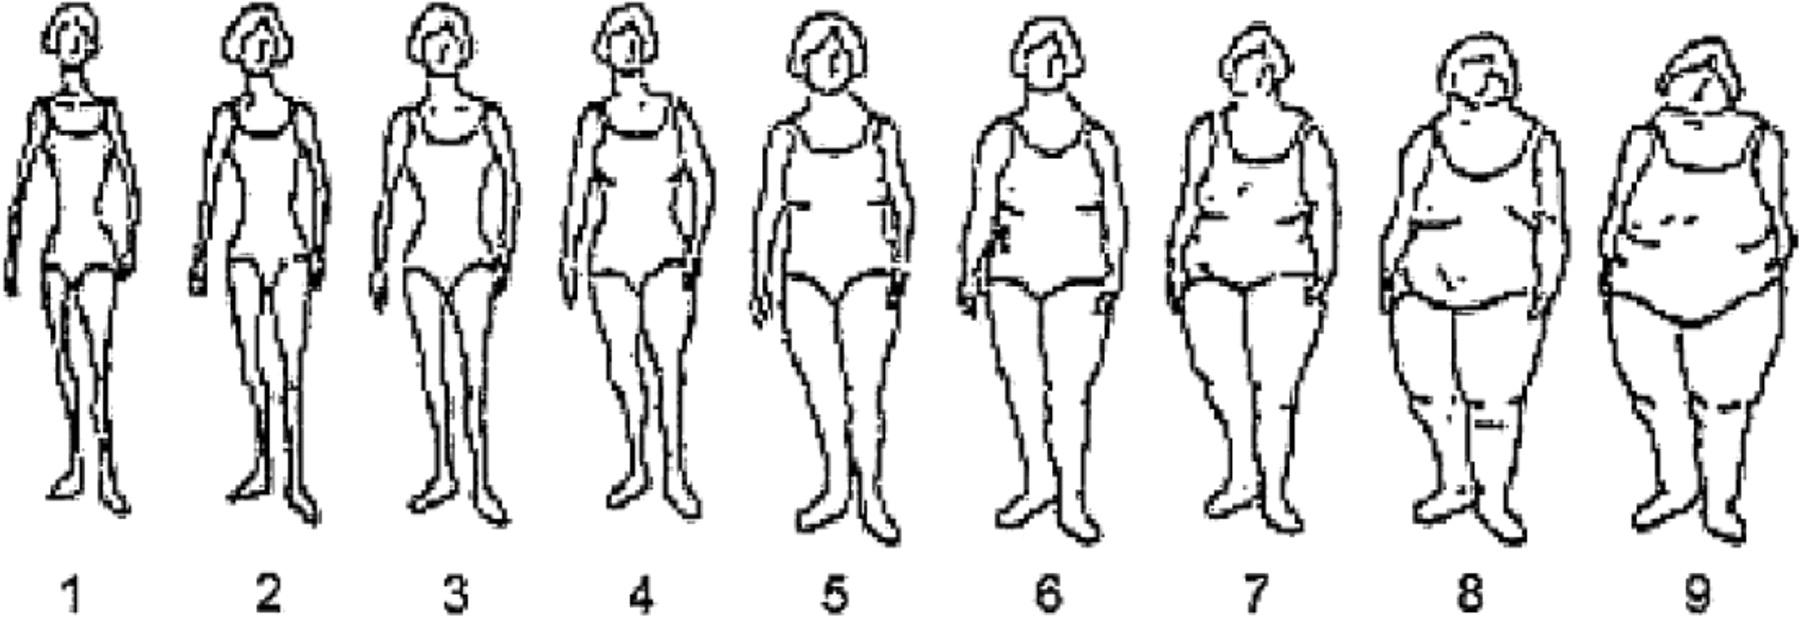 body size pictures - Timiz.conceptzmusic.co